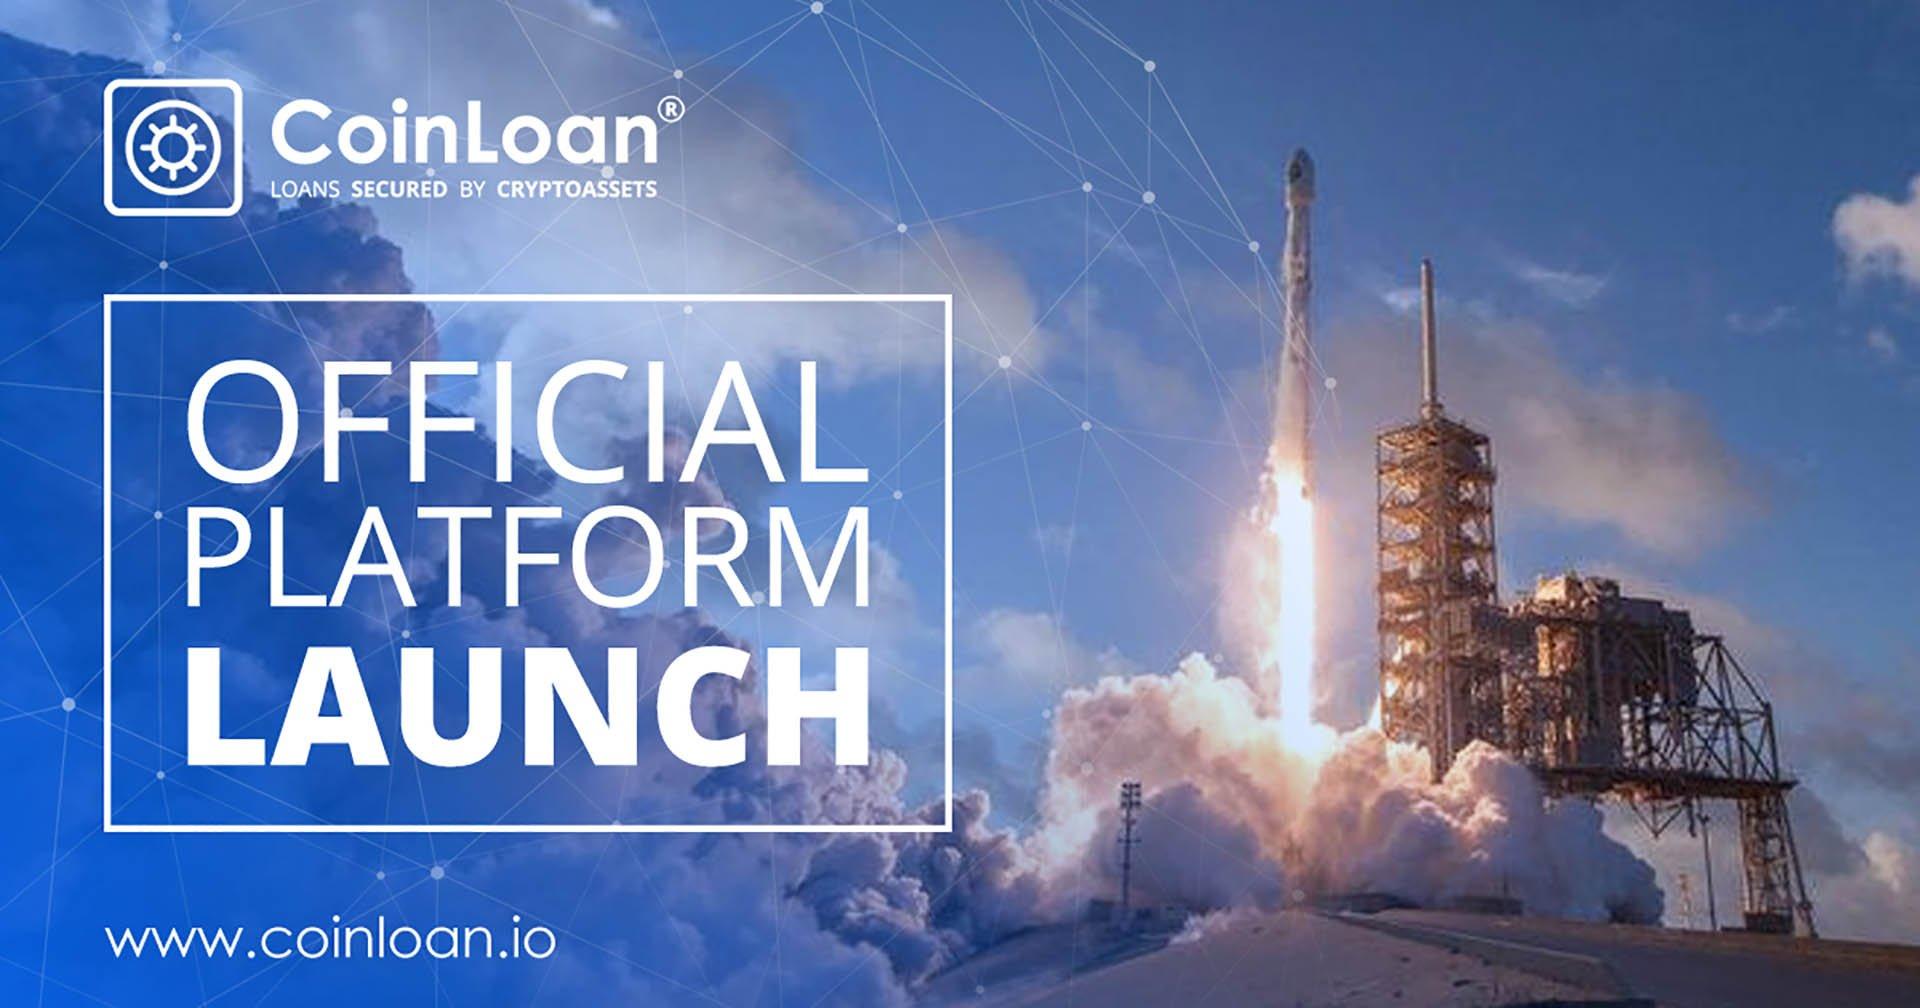 CoinLoan Opens Platform to Bridge Gap Between Lenders and Borrowers